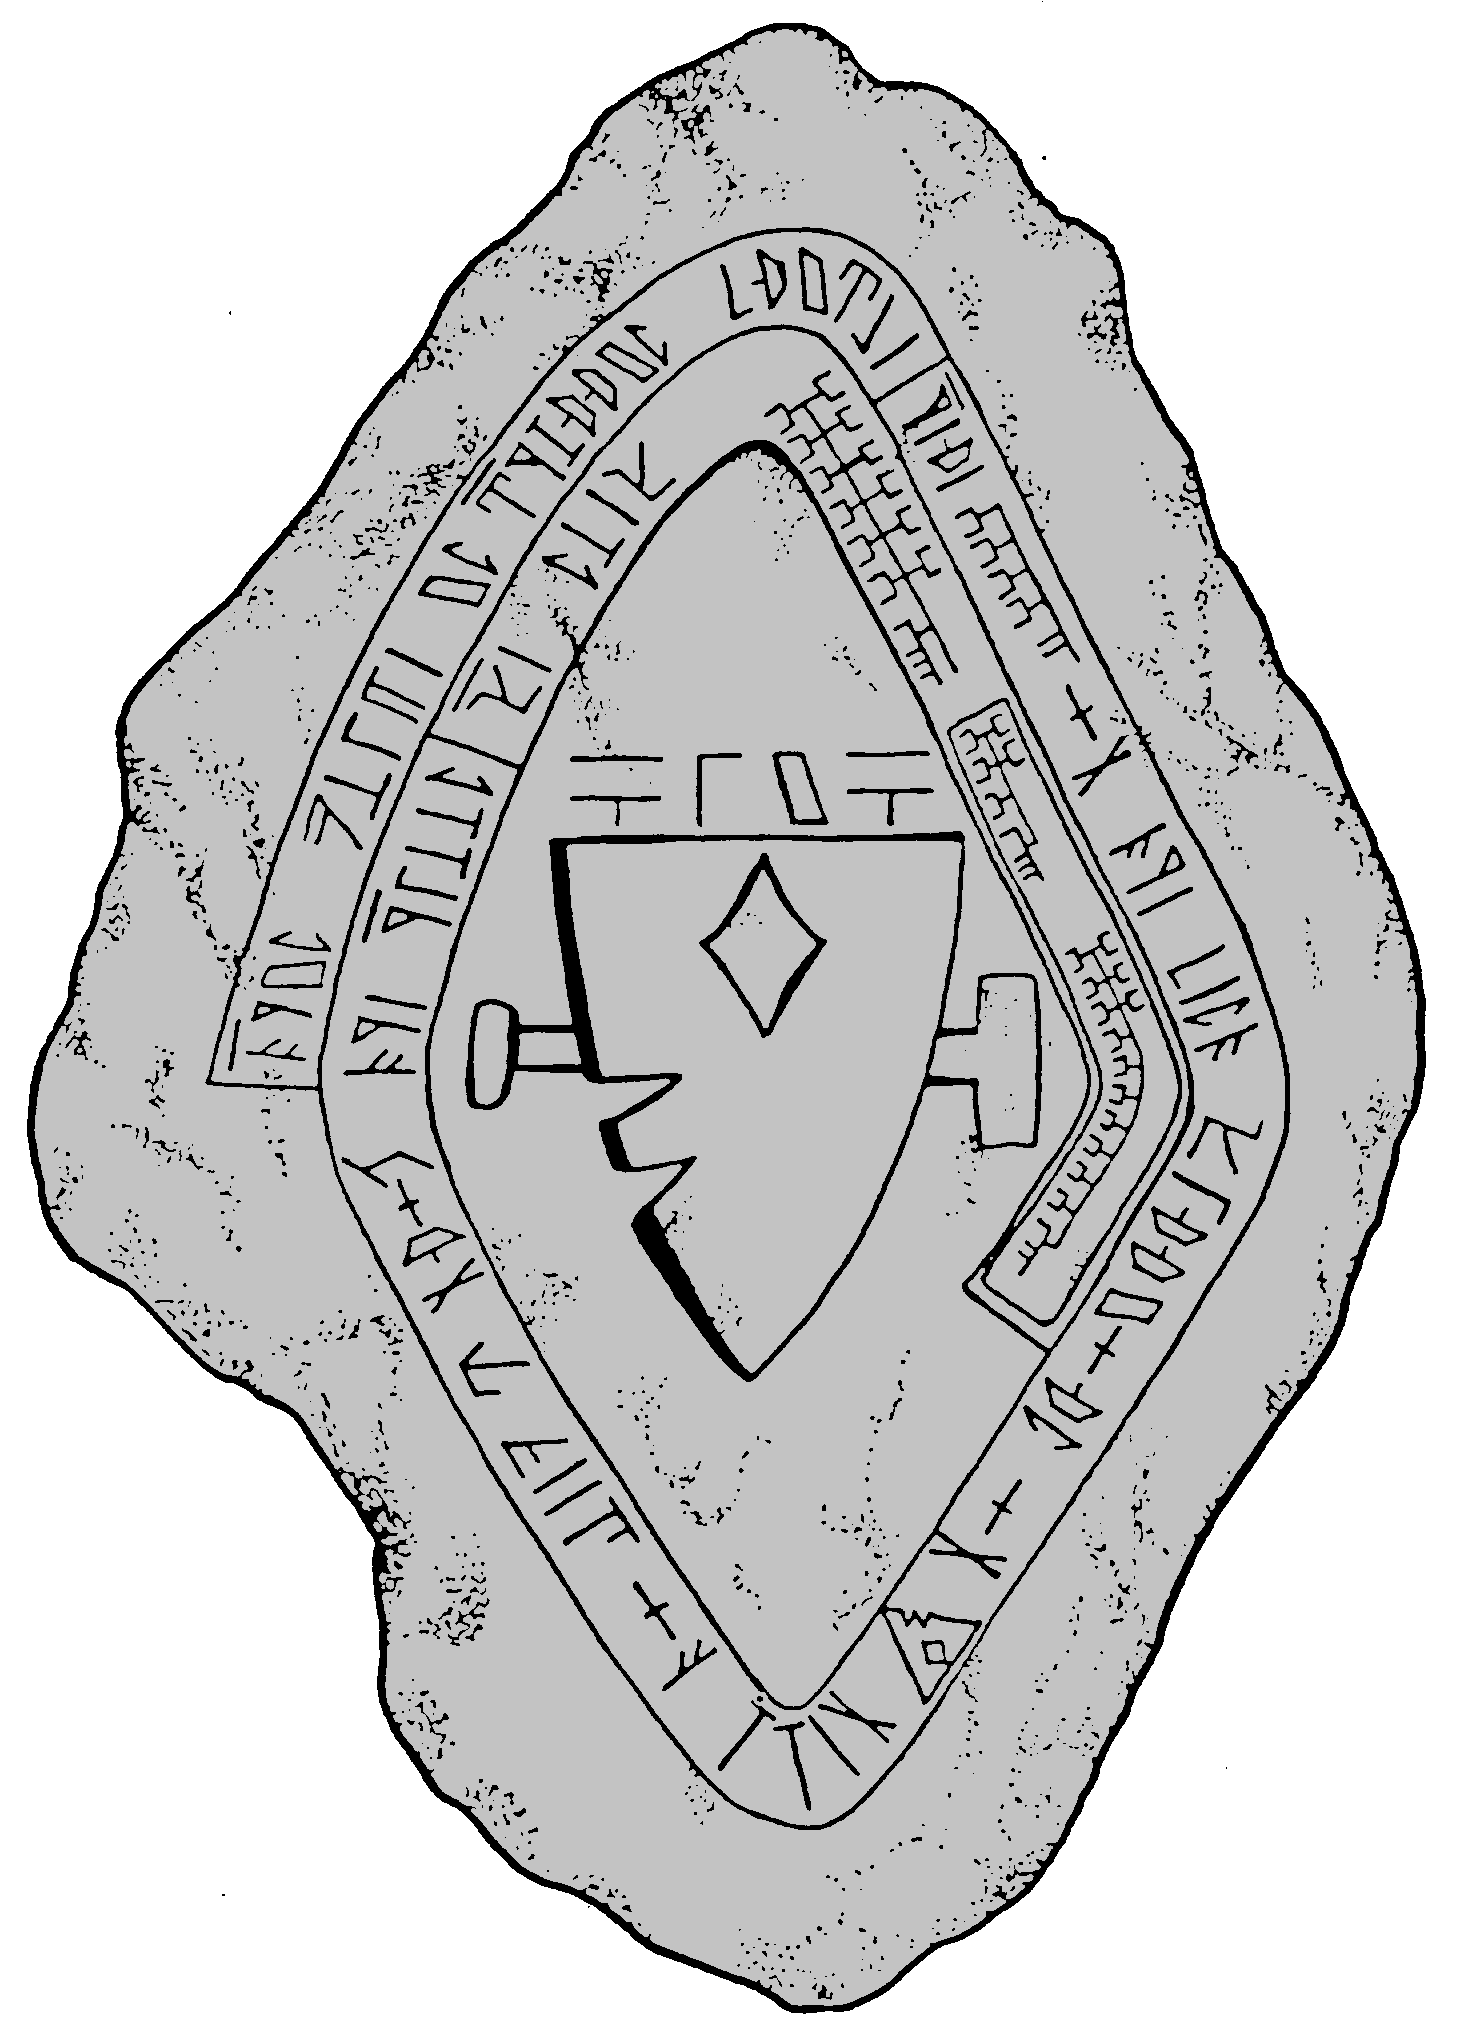 Dethek | Forgotten Realms Wiki | FANDOM powered by Wikia